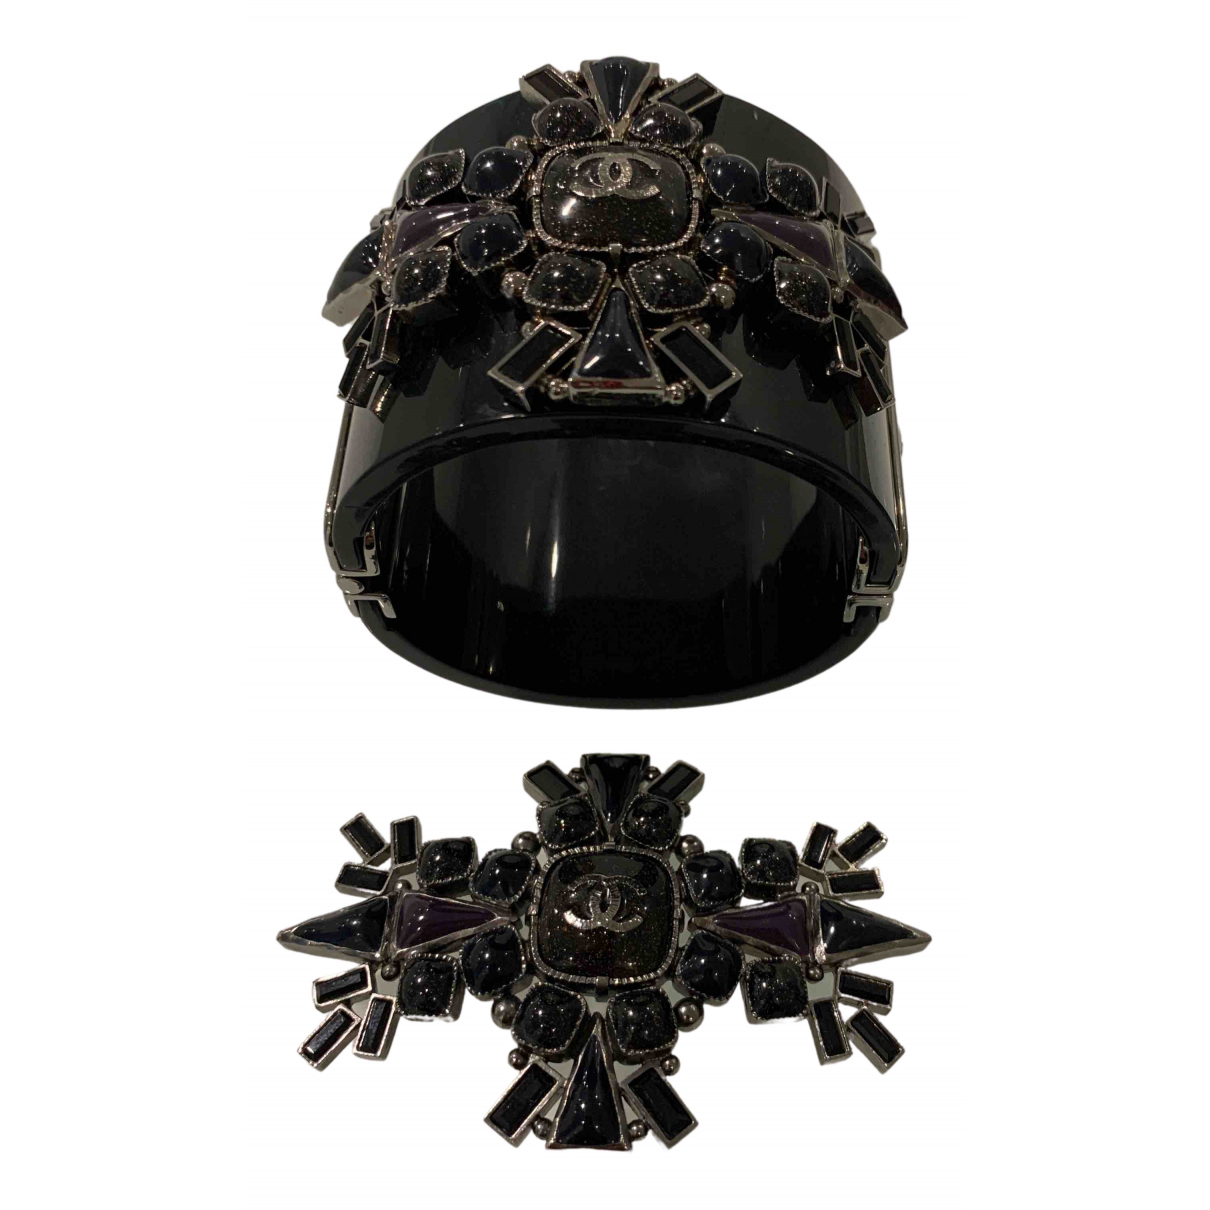 Chanel \N Schmuck-set in  Schwarz Metall